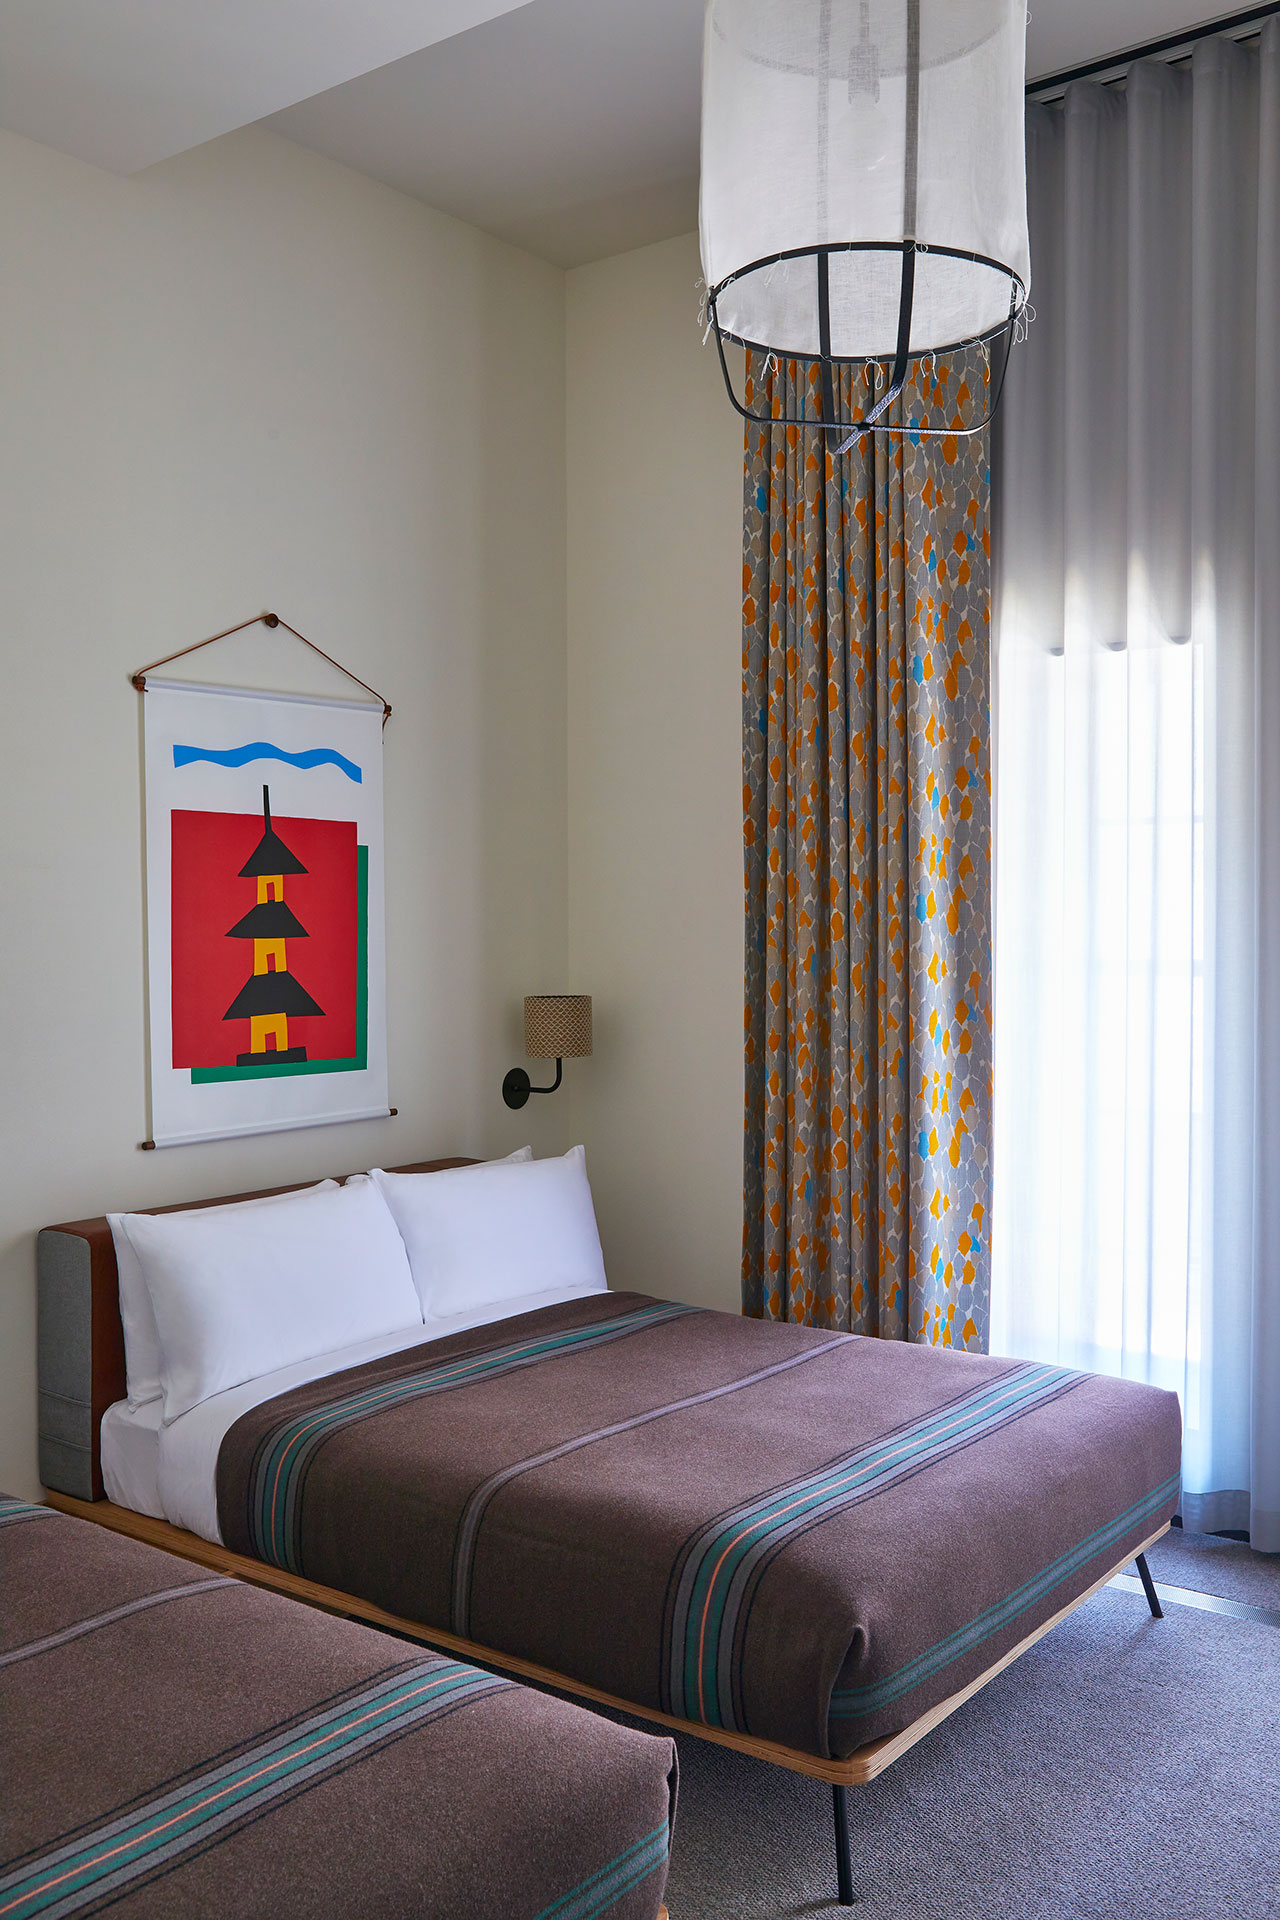 Ace Hotel Kyoto. Guestroom. Photo by Yoshihiro Makino.